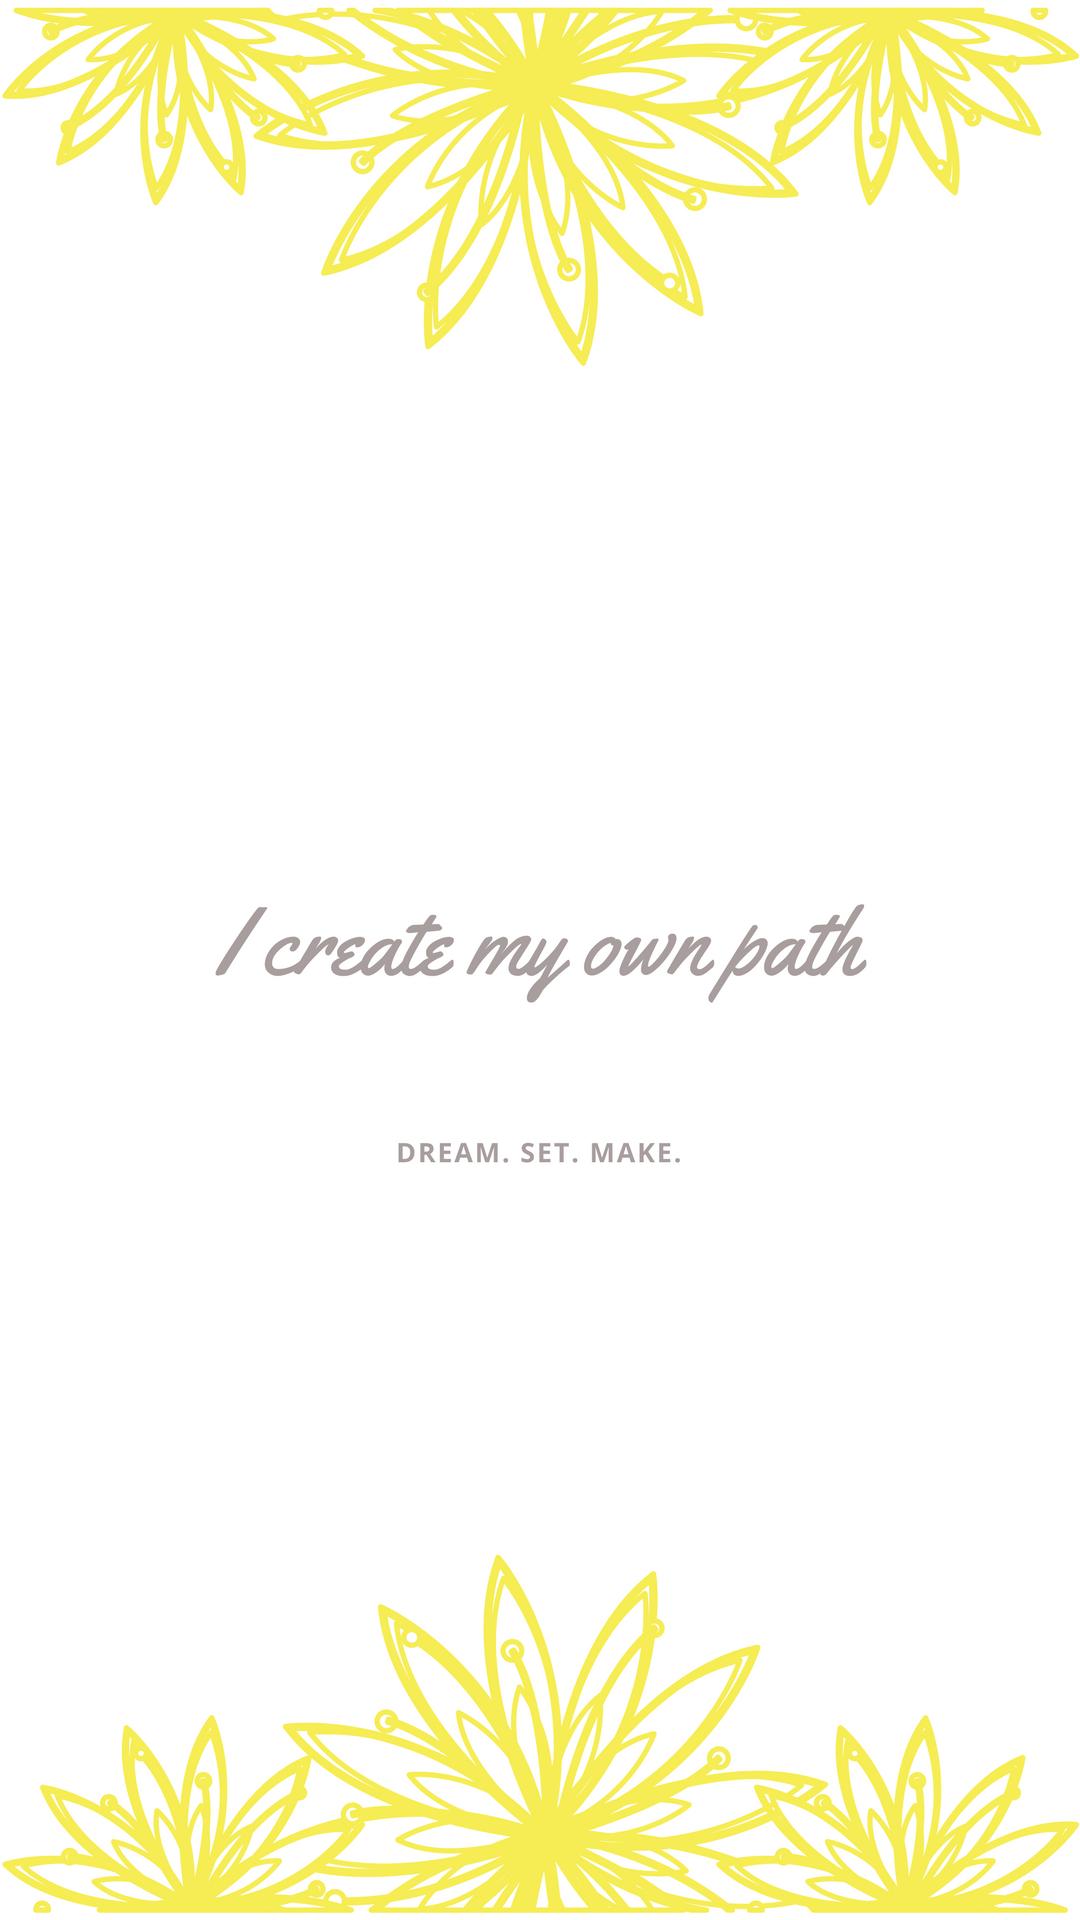 I create my own path.png